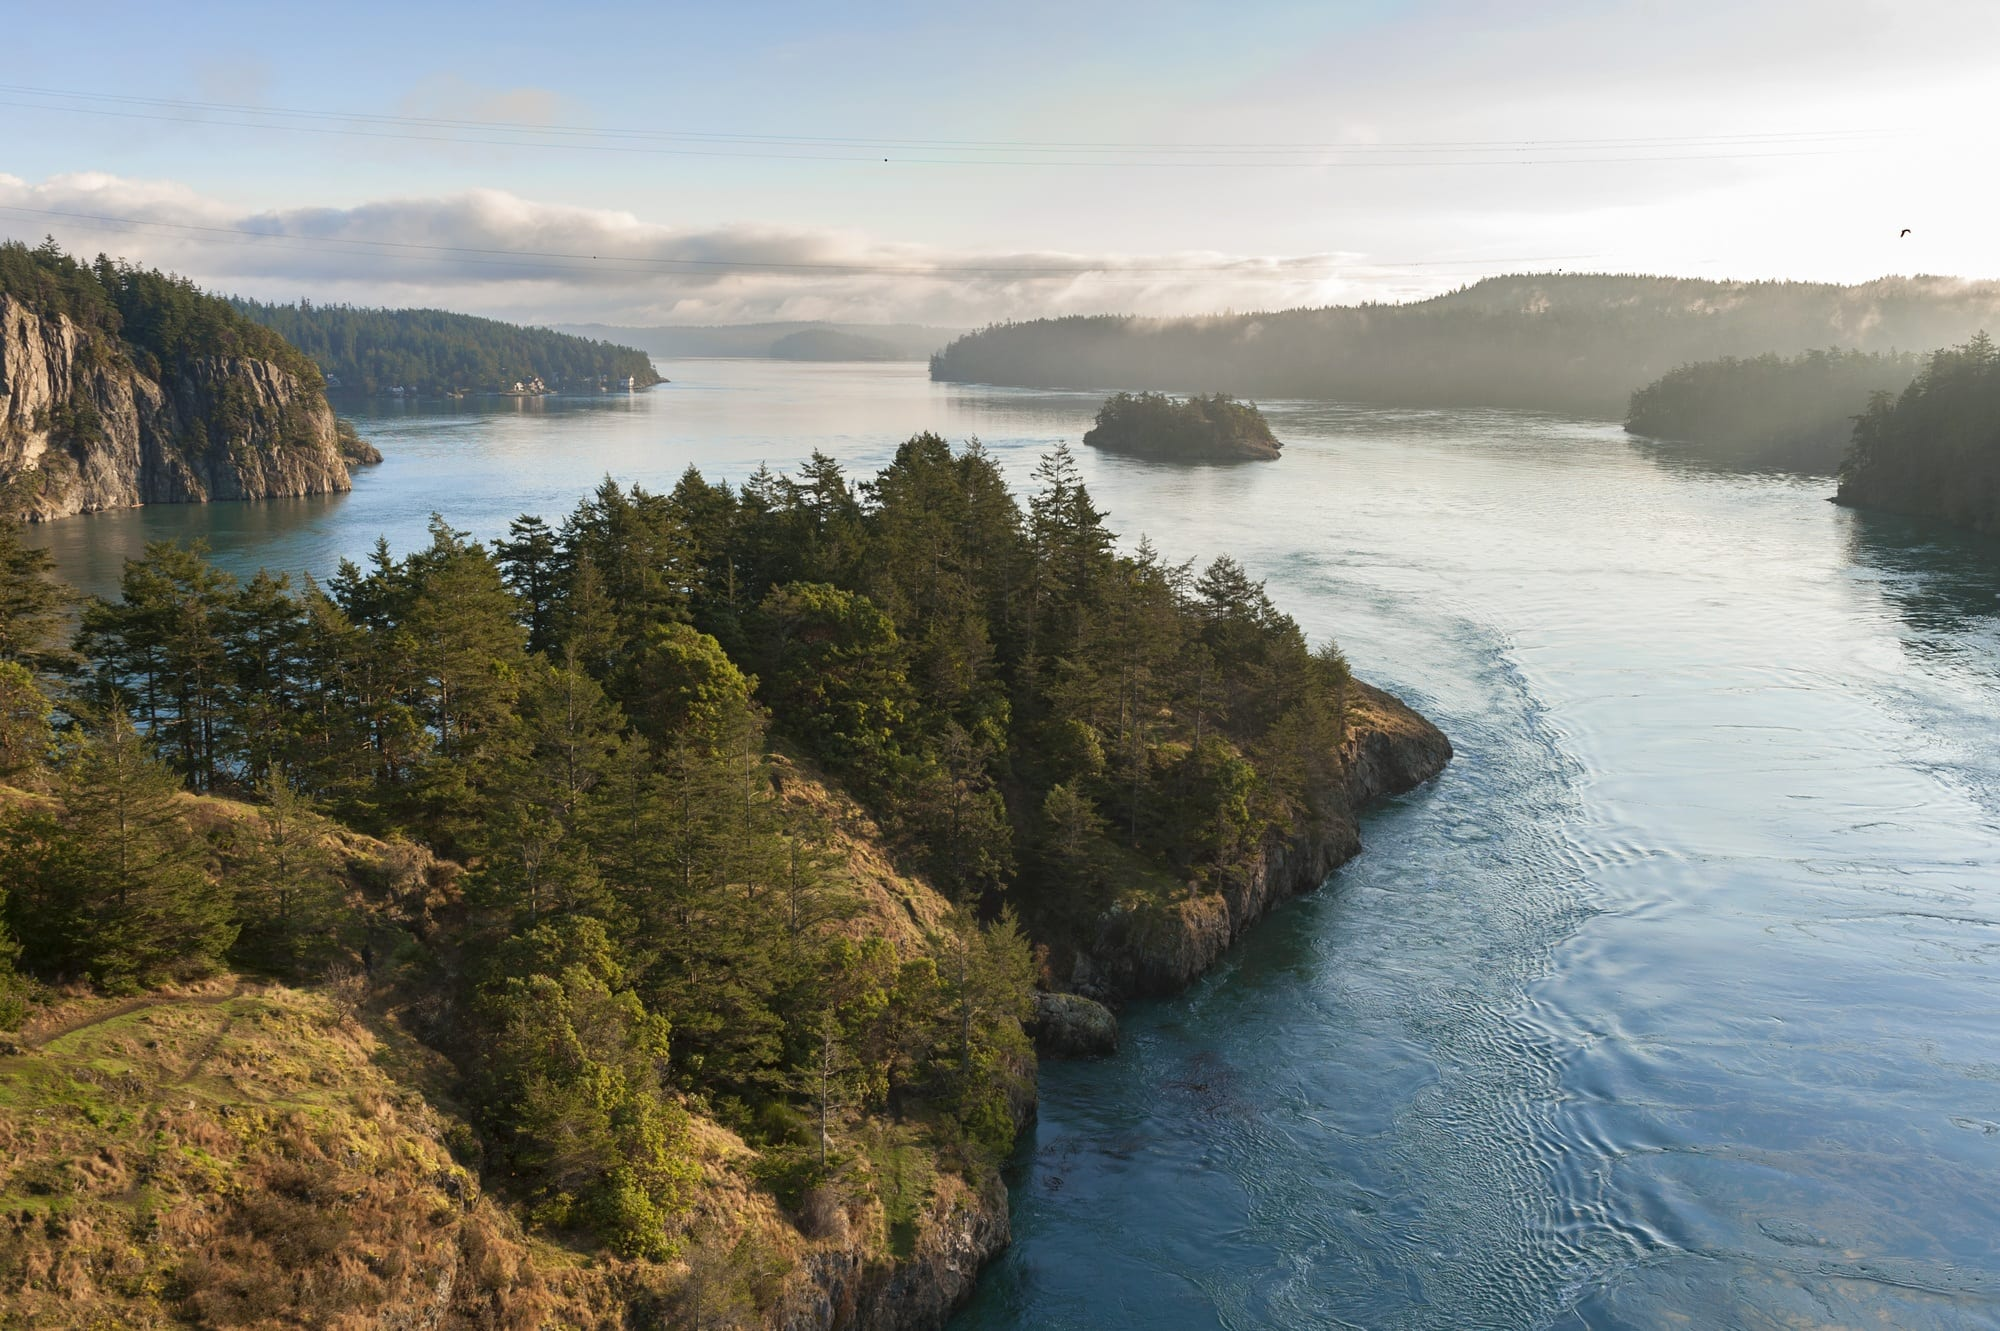 Washington Road Trip: 13 Best Stops for Outdoor Adventure